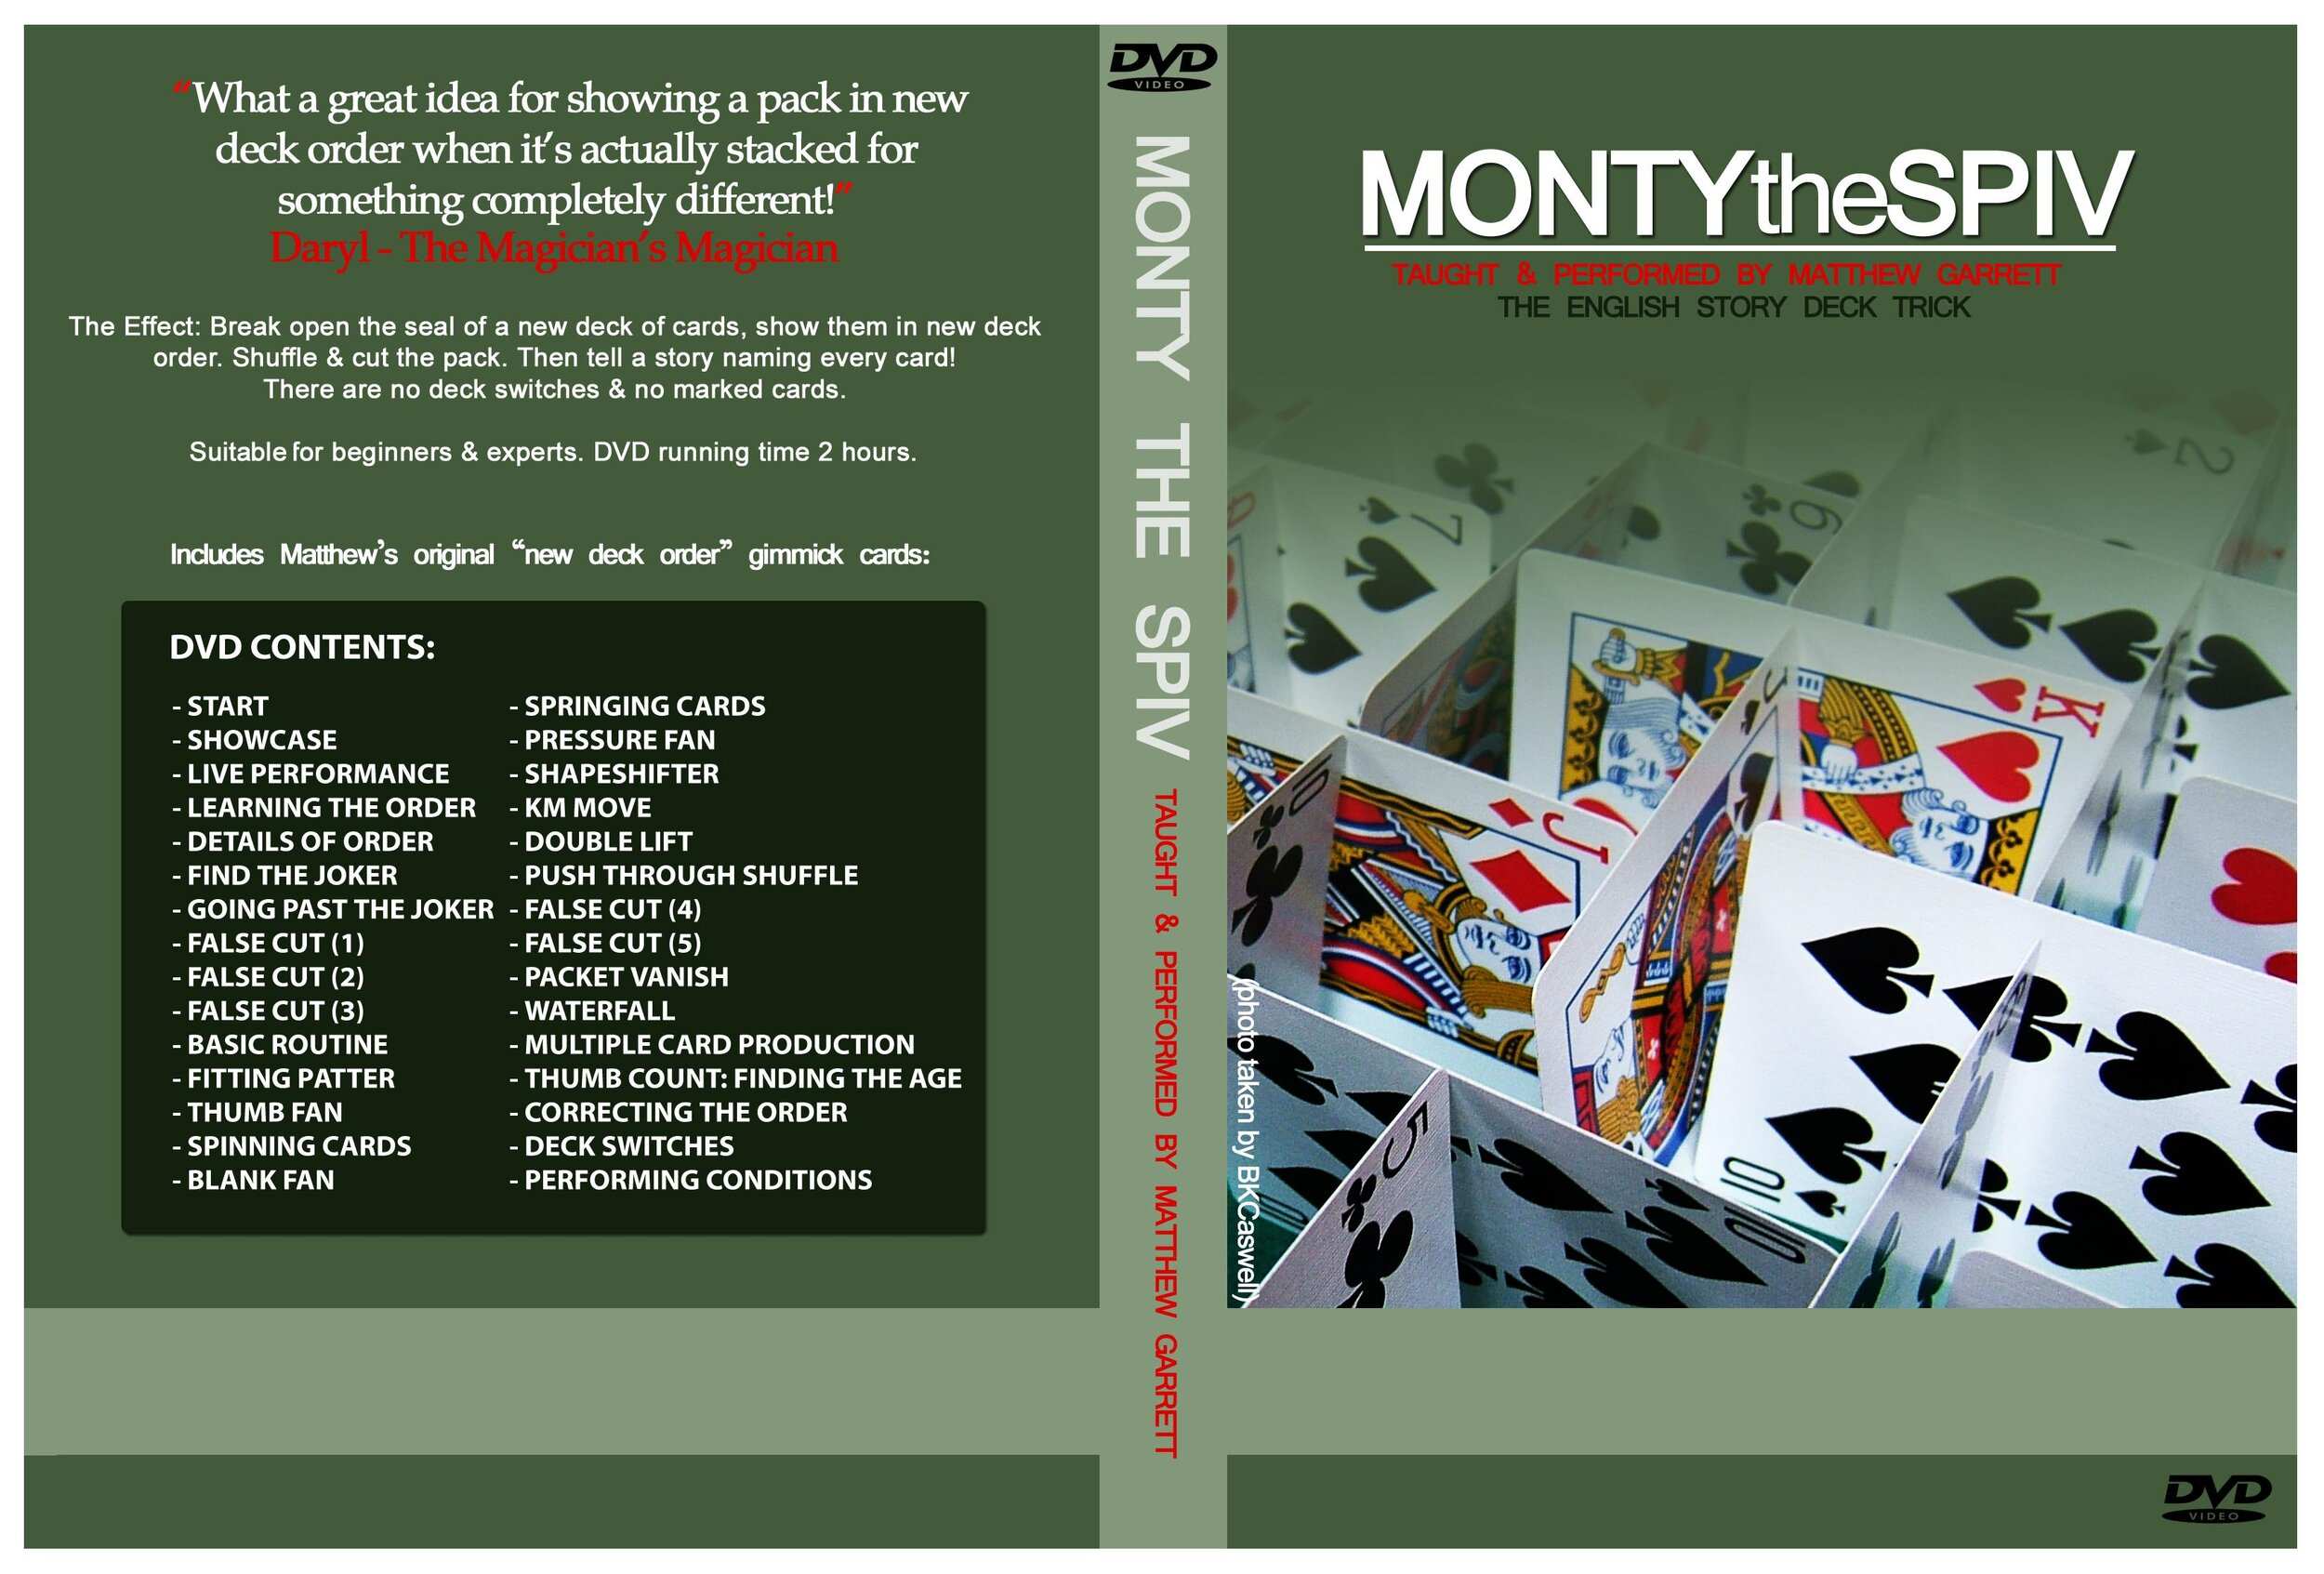 Monty The Spiv sleeve.jpg